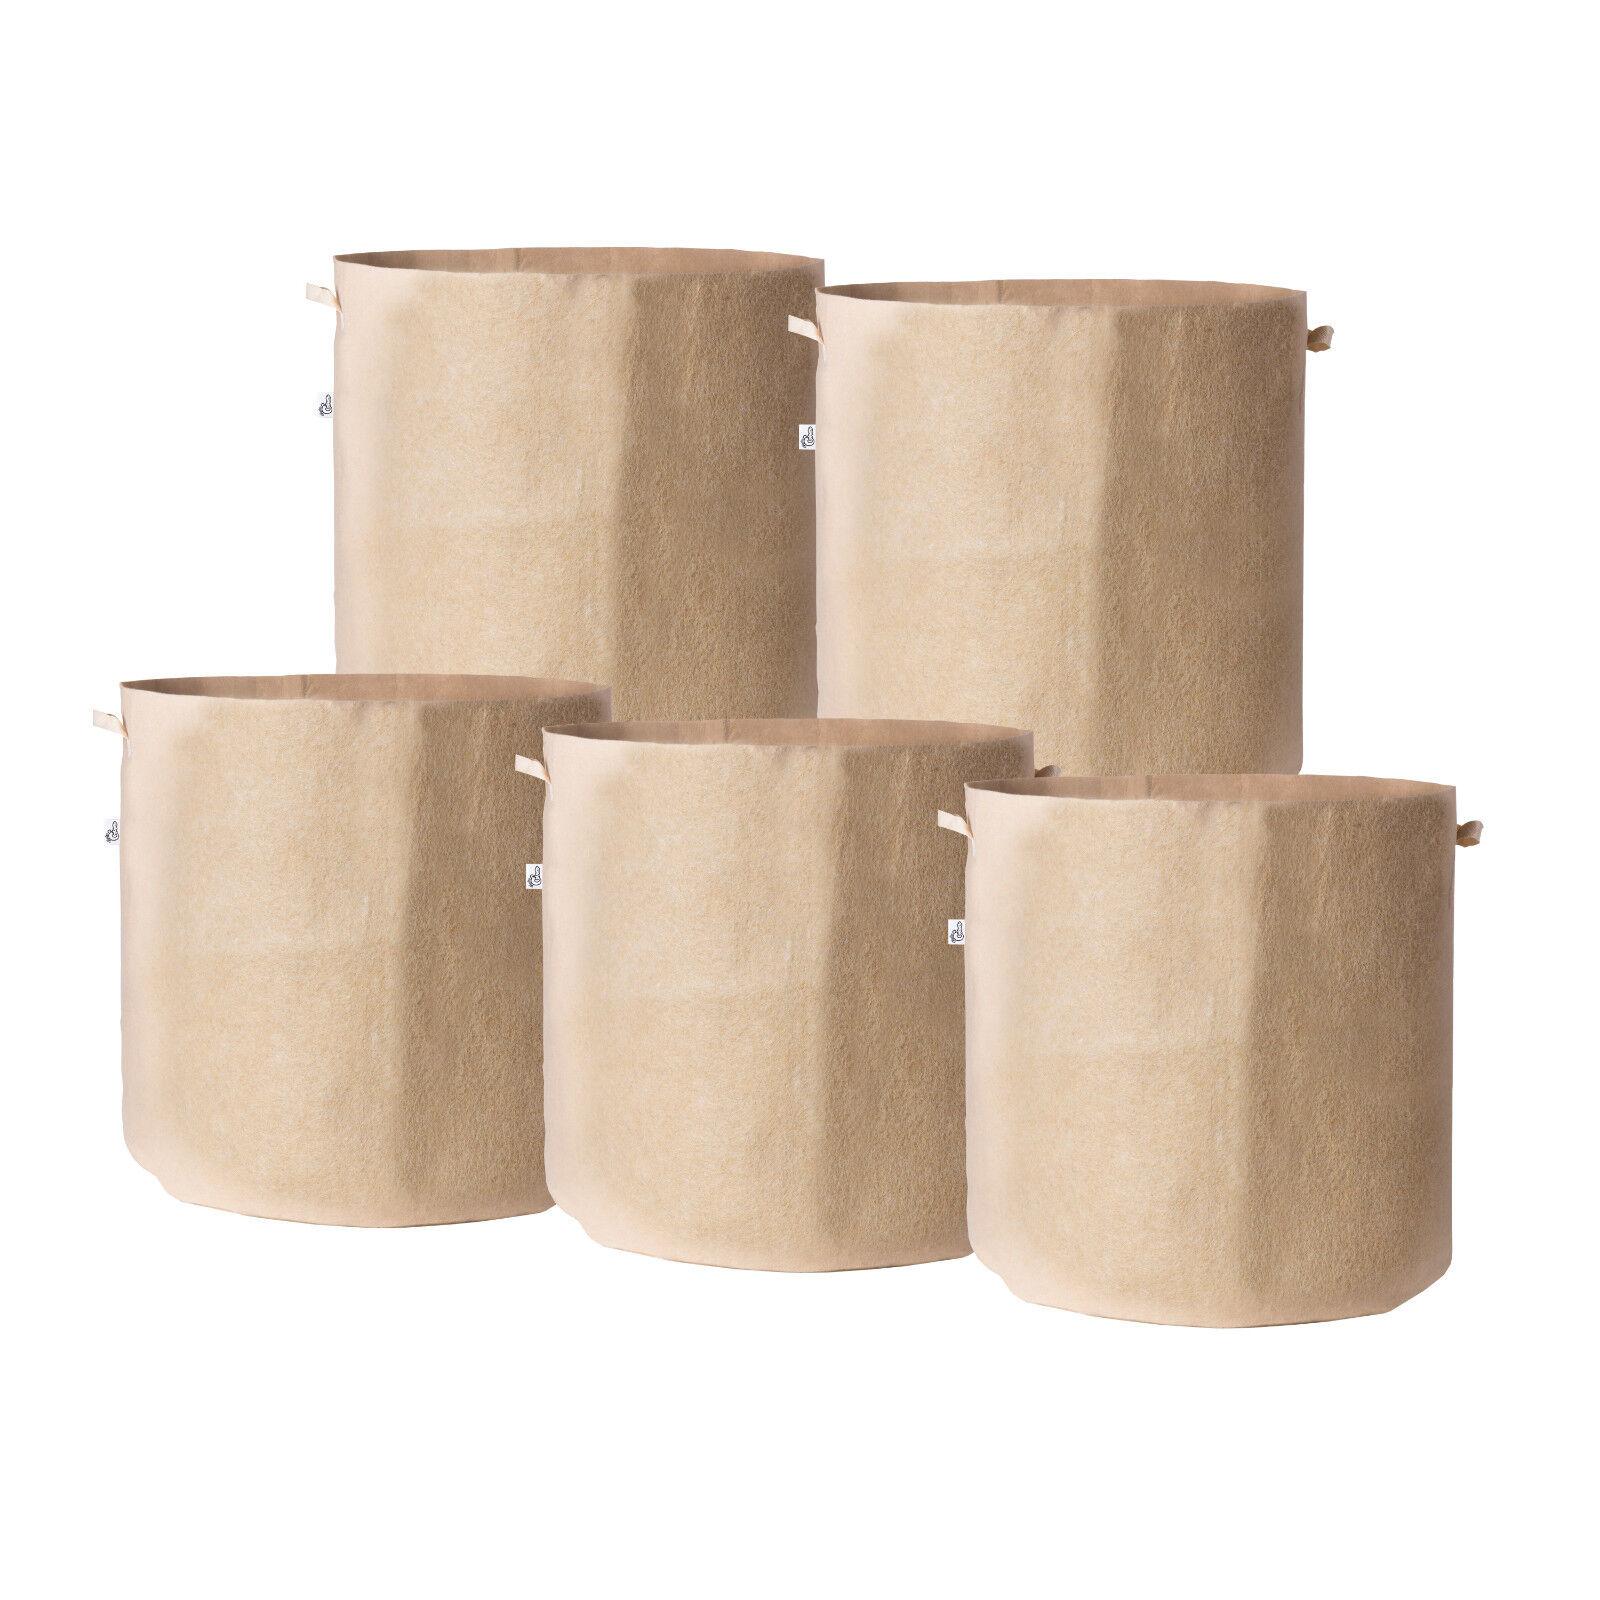 5Pcs/Pack Tan Fabric Grow Pots Breathable Plant Bags Smart P